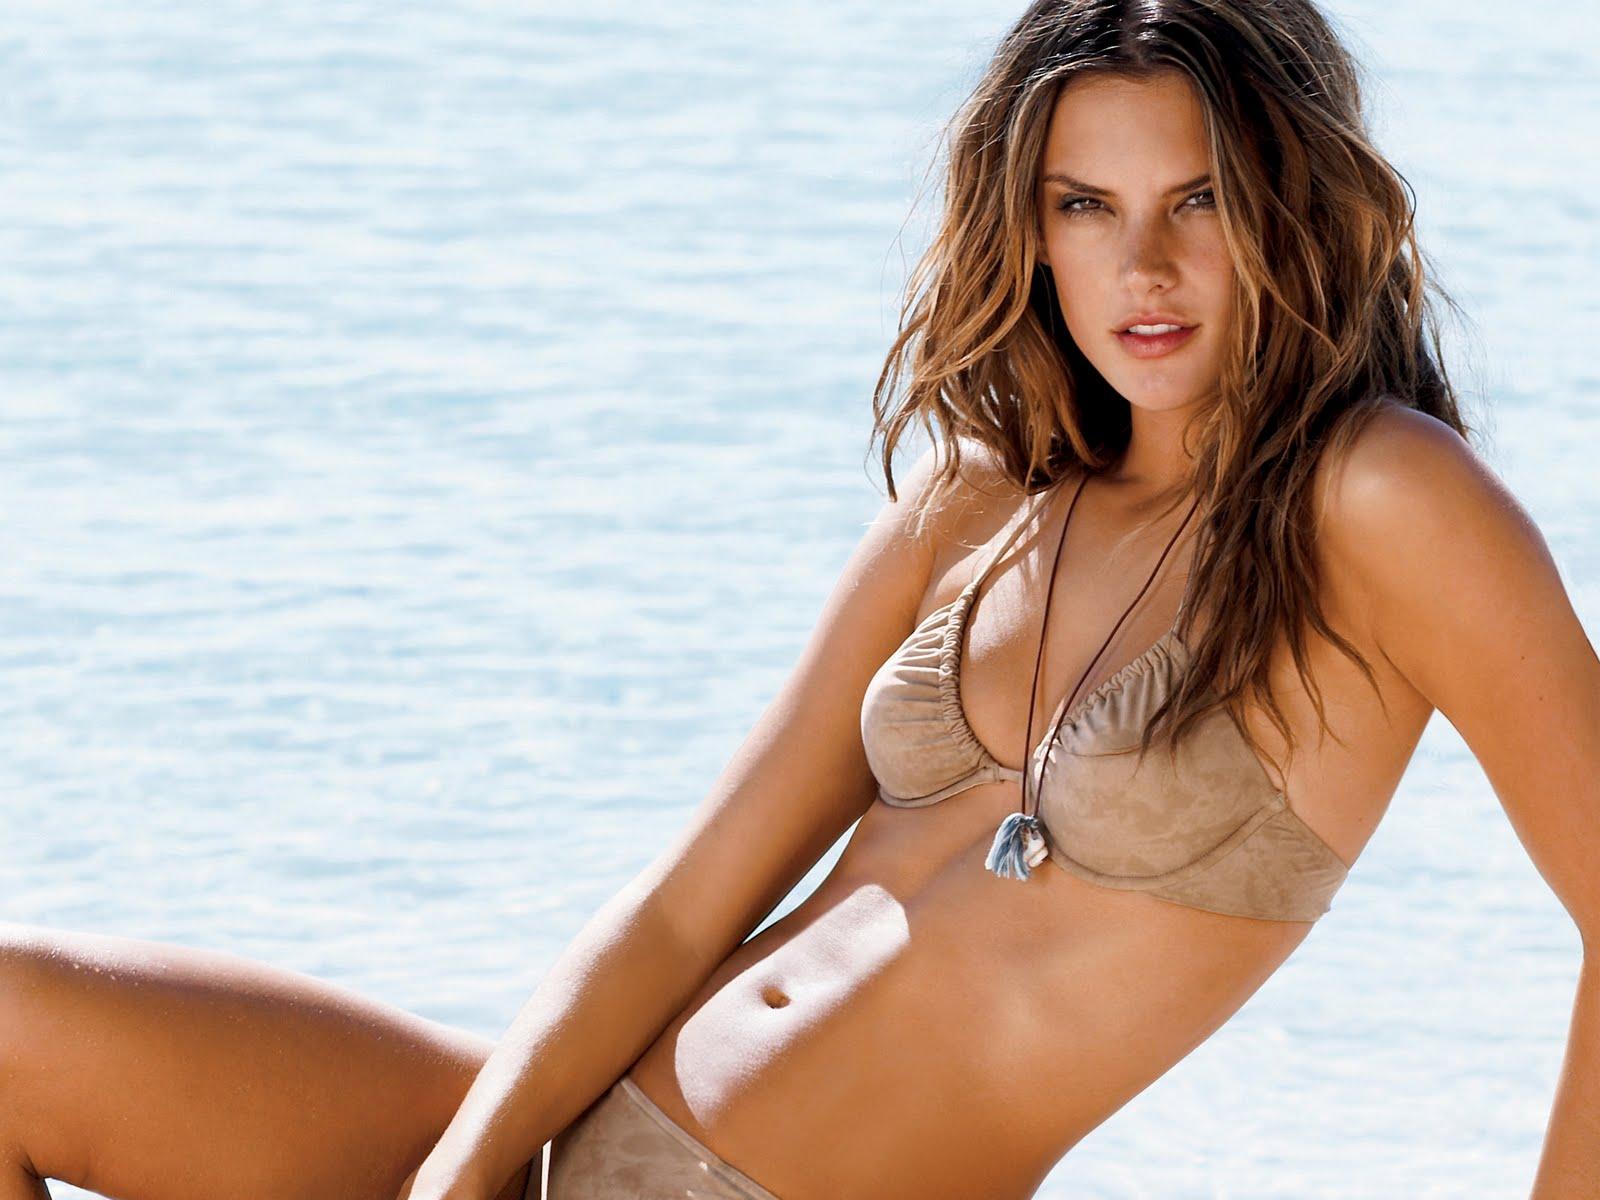 http://2.bp.blogspot.com/-vl6cFdLzk1k/TcTPxQwPRzI/AAAAAAAAAhs/YOHejATyBQE/s1600/alessandra_ambrosio_bikini_wallpapers.jpg